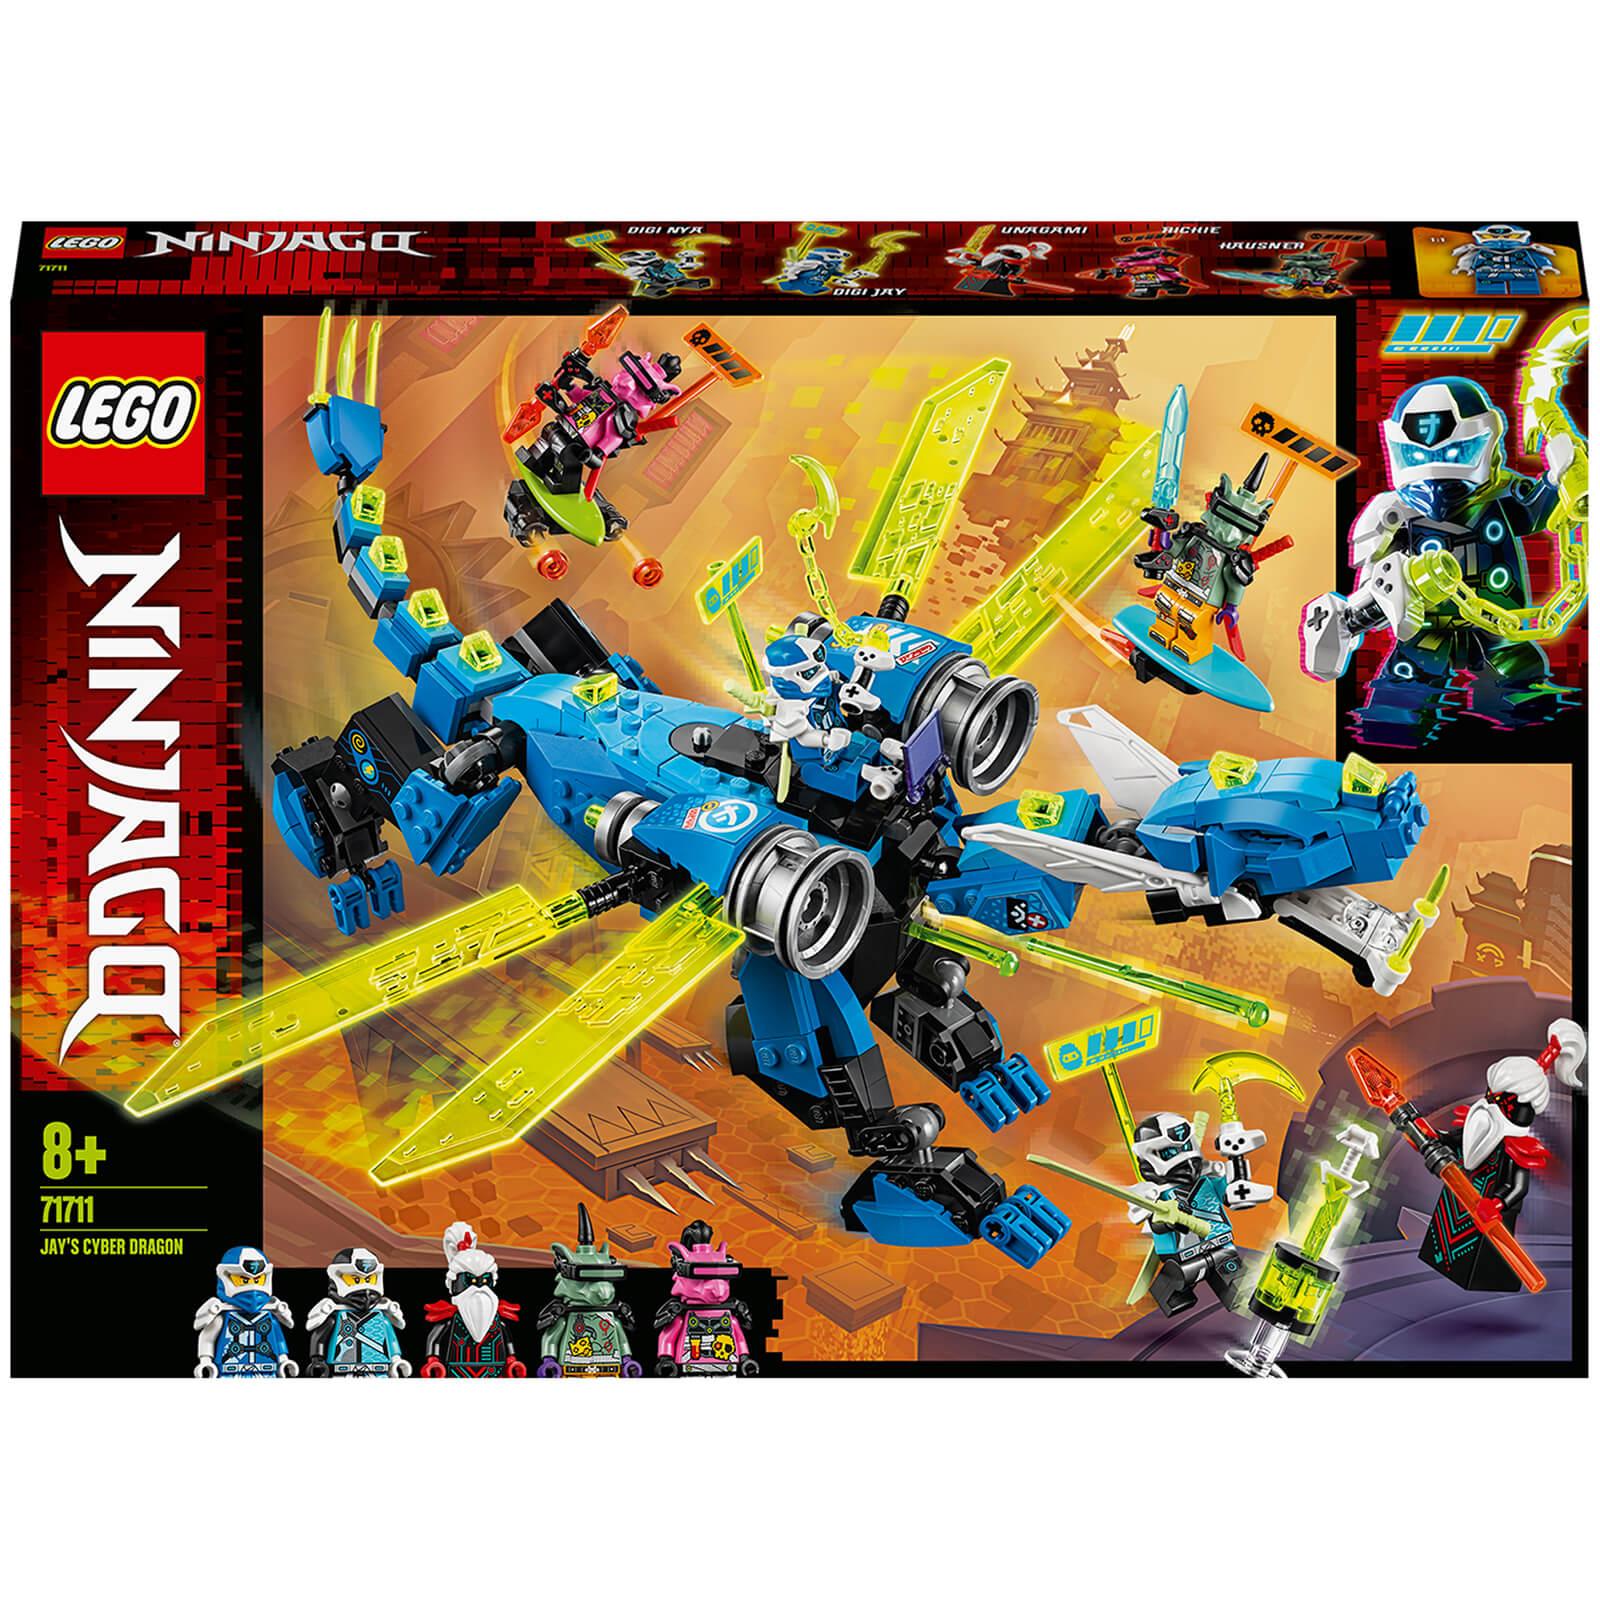 Image of 71711 LEGO® NINJAGO Jays cyber dragon